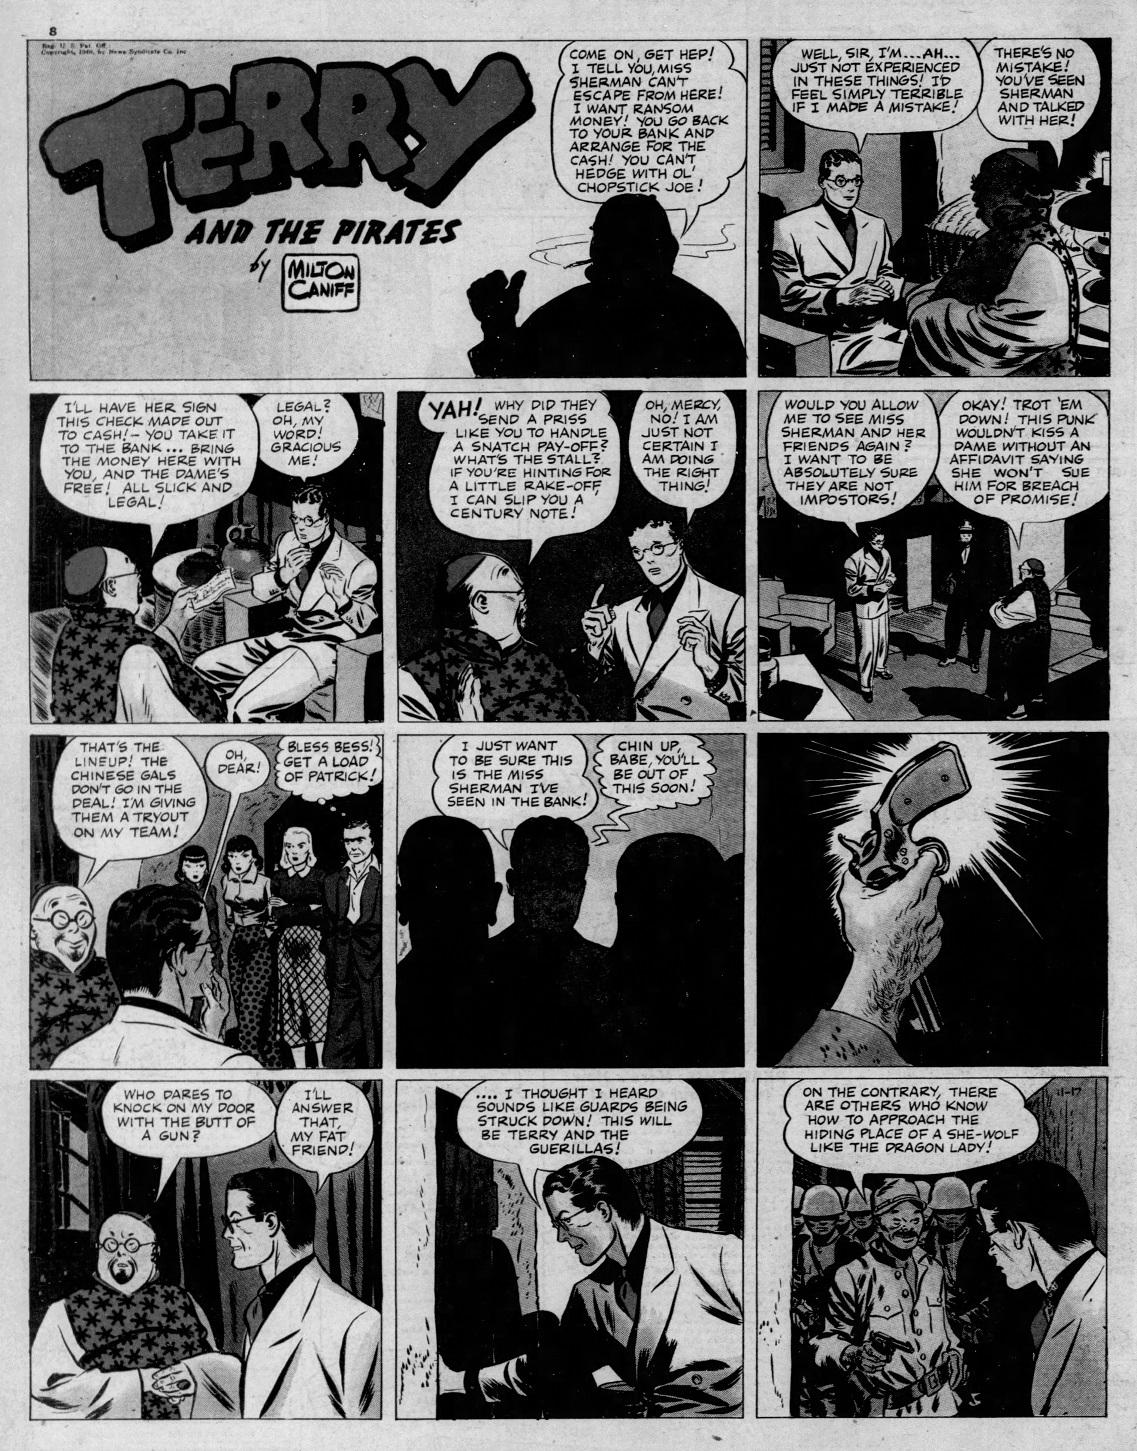 Daily_News_Sun__Nov_17__1940_ (5).jpg